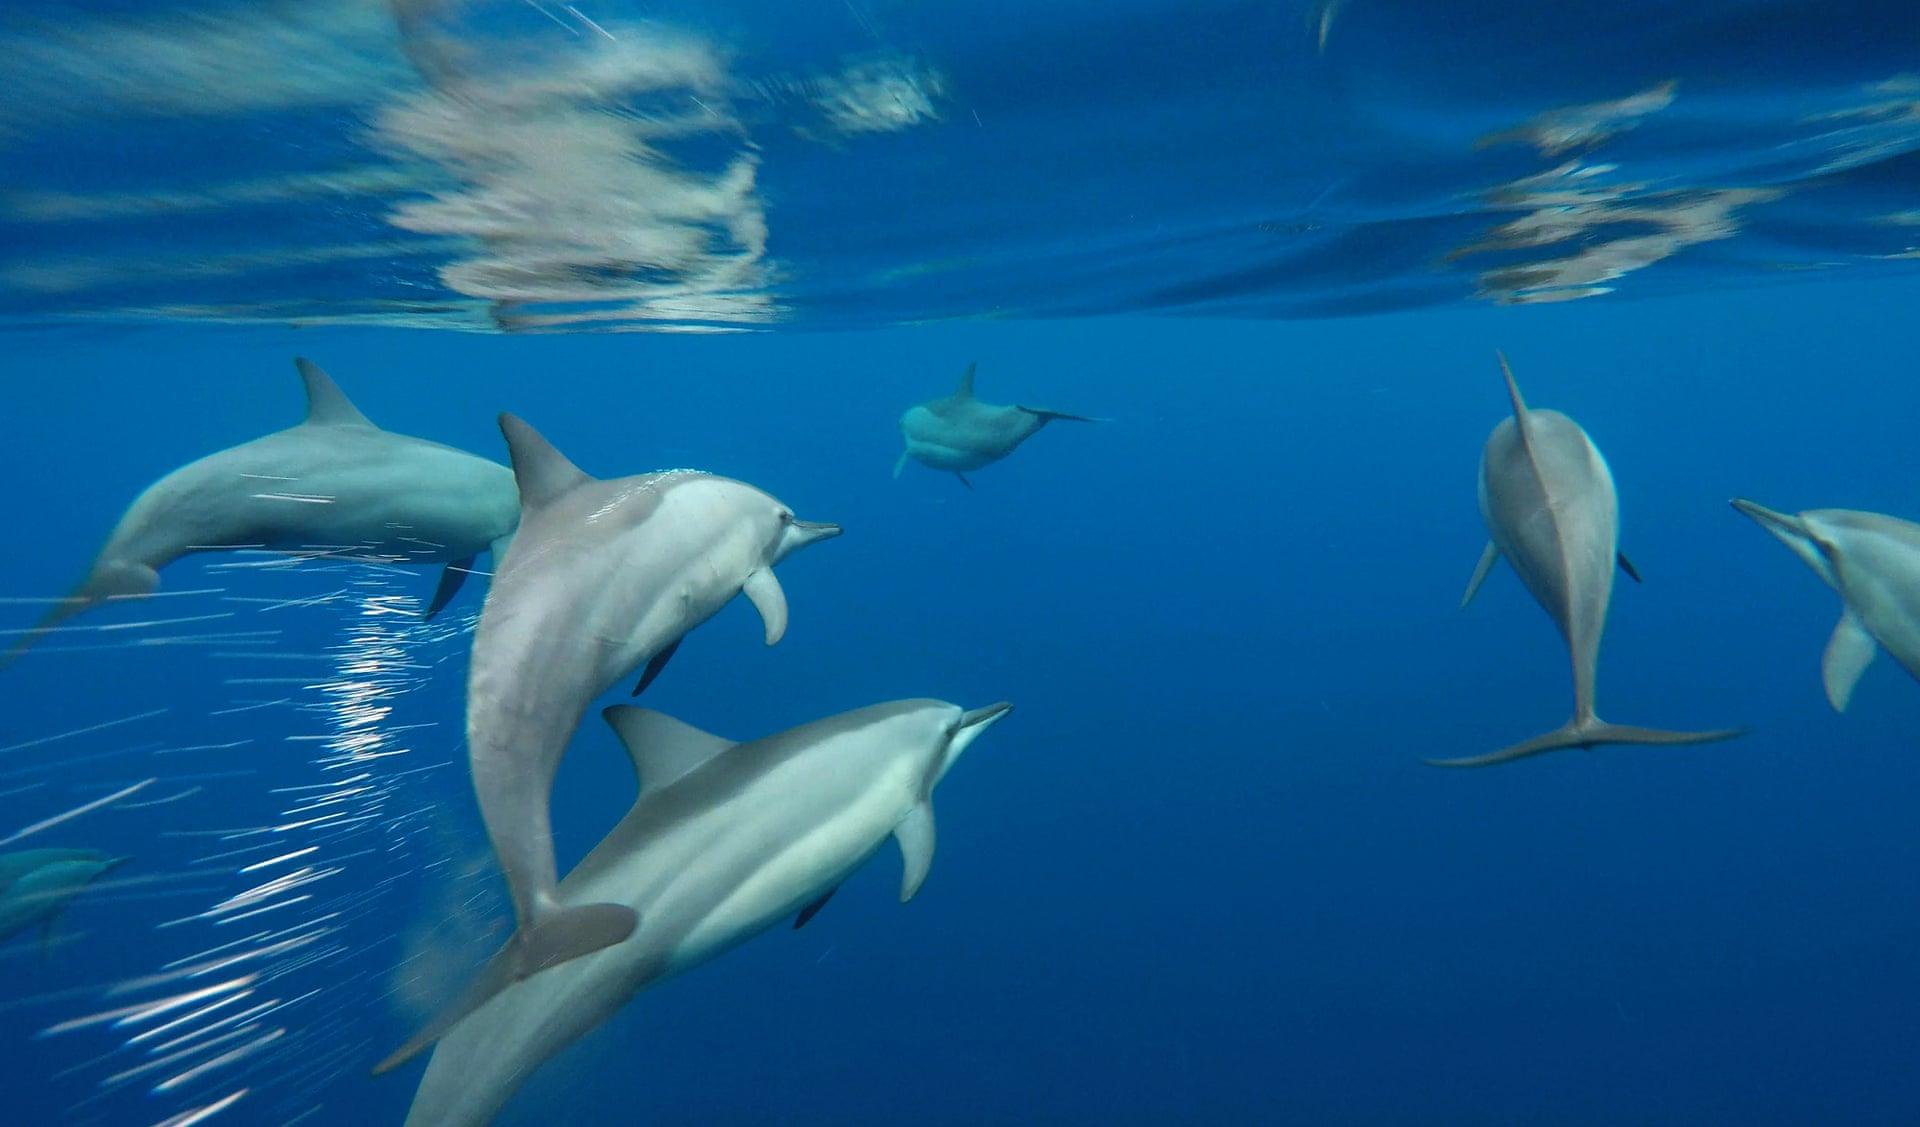 Source: Photograph: Paul Hilton/Conservation International